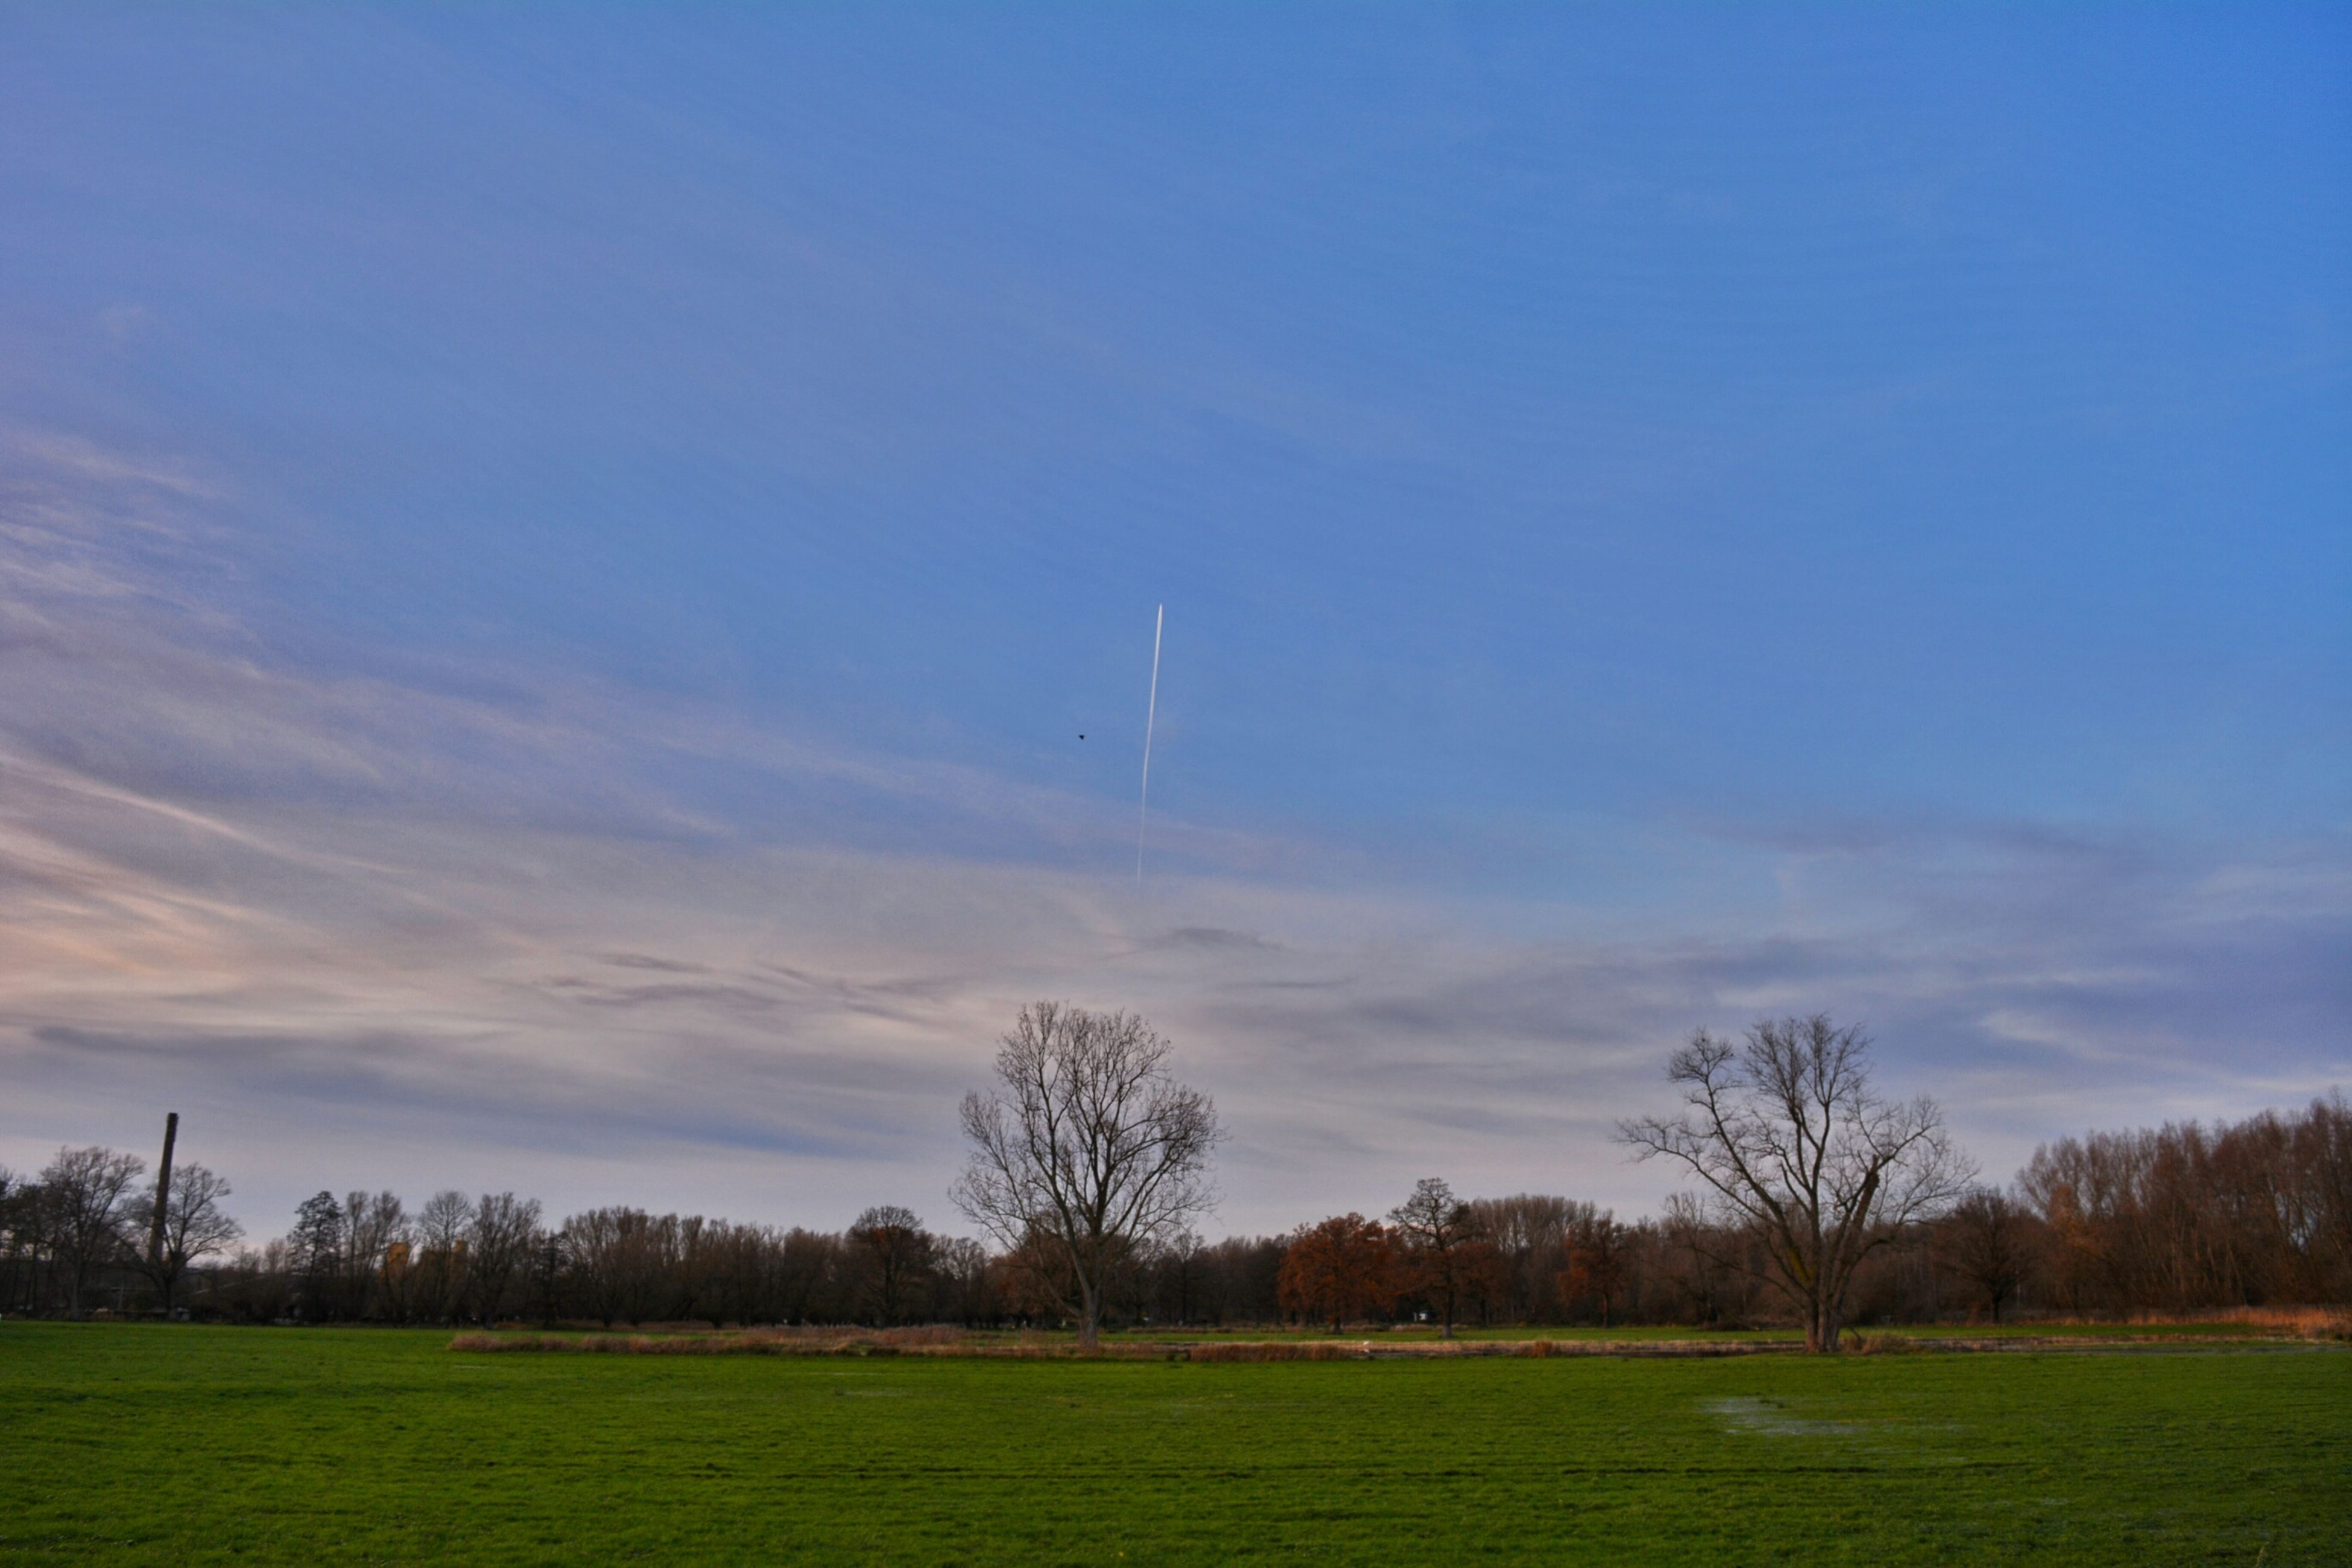 landscape, field, tranquil scene, tranquility, tree, grass, sky, scenics, beauty in nature, nature, blue, grassy, cloud - sky, non-urban scene, bare tree, rural scene, cloud, idyllic, silhouette, outdoors